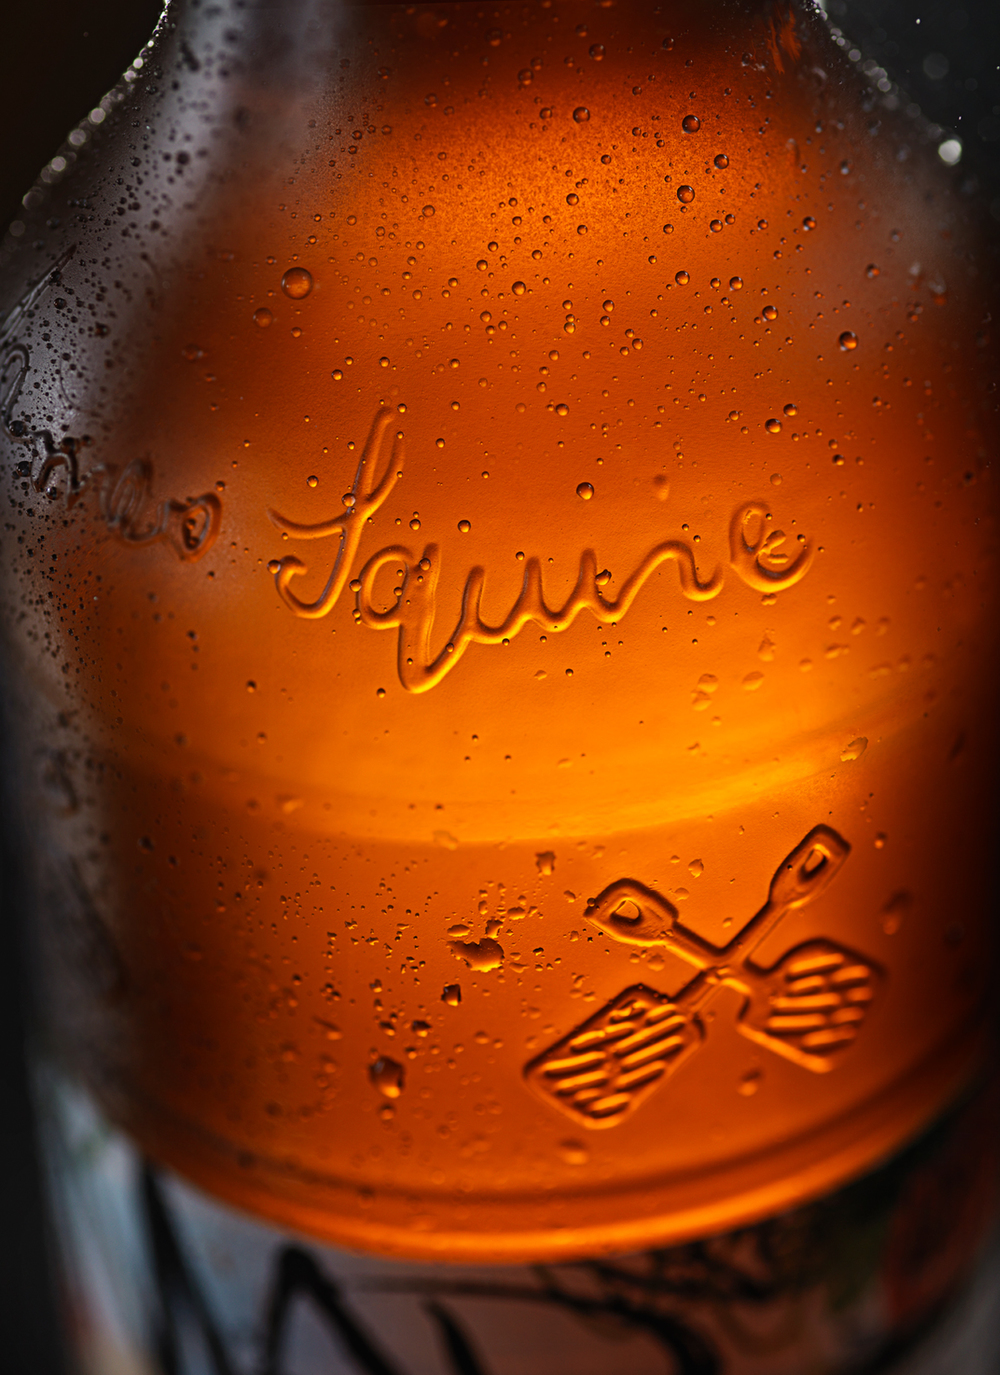 Mad_Brewers_Garden_De_Paradisi_Bottle_Detail_LR.jpg